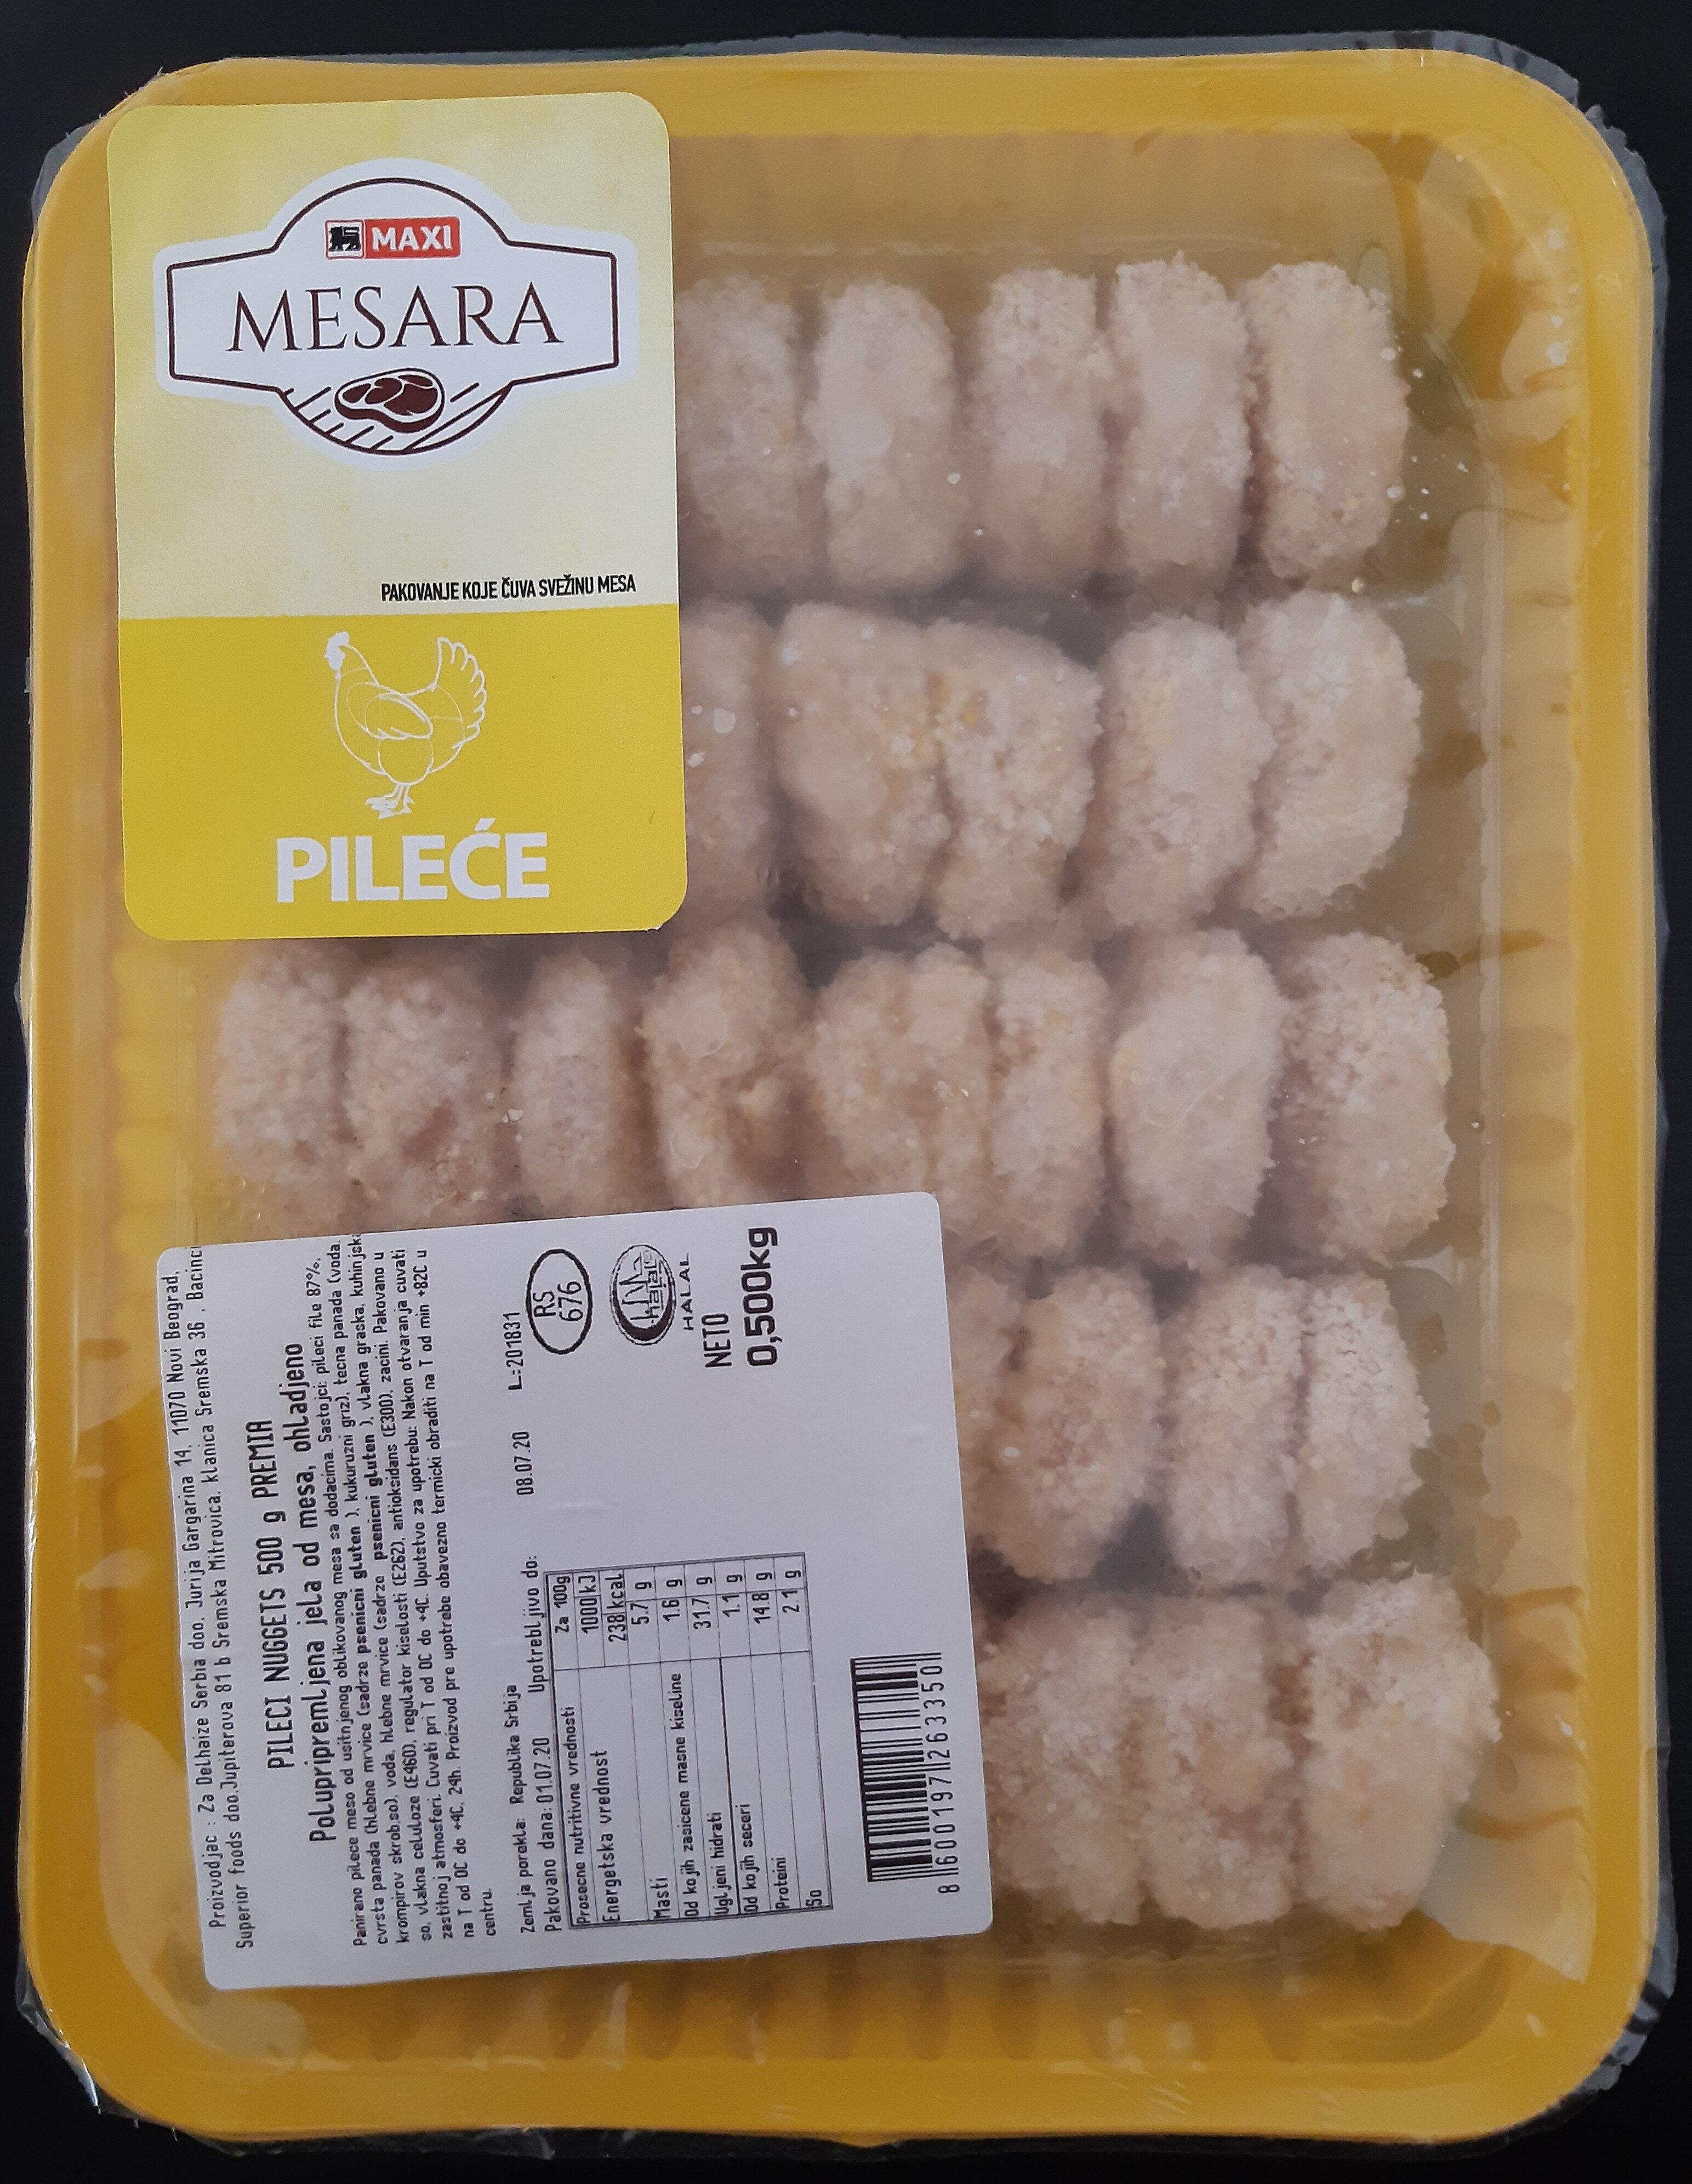 Pileći nuggets - Product - en